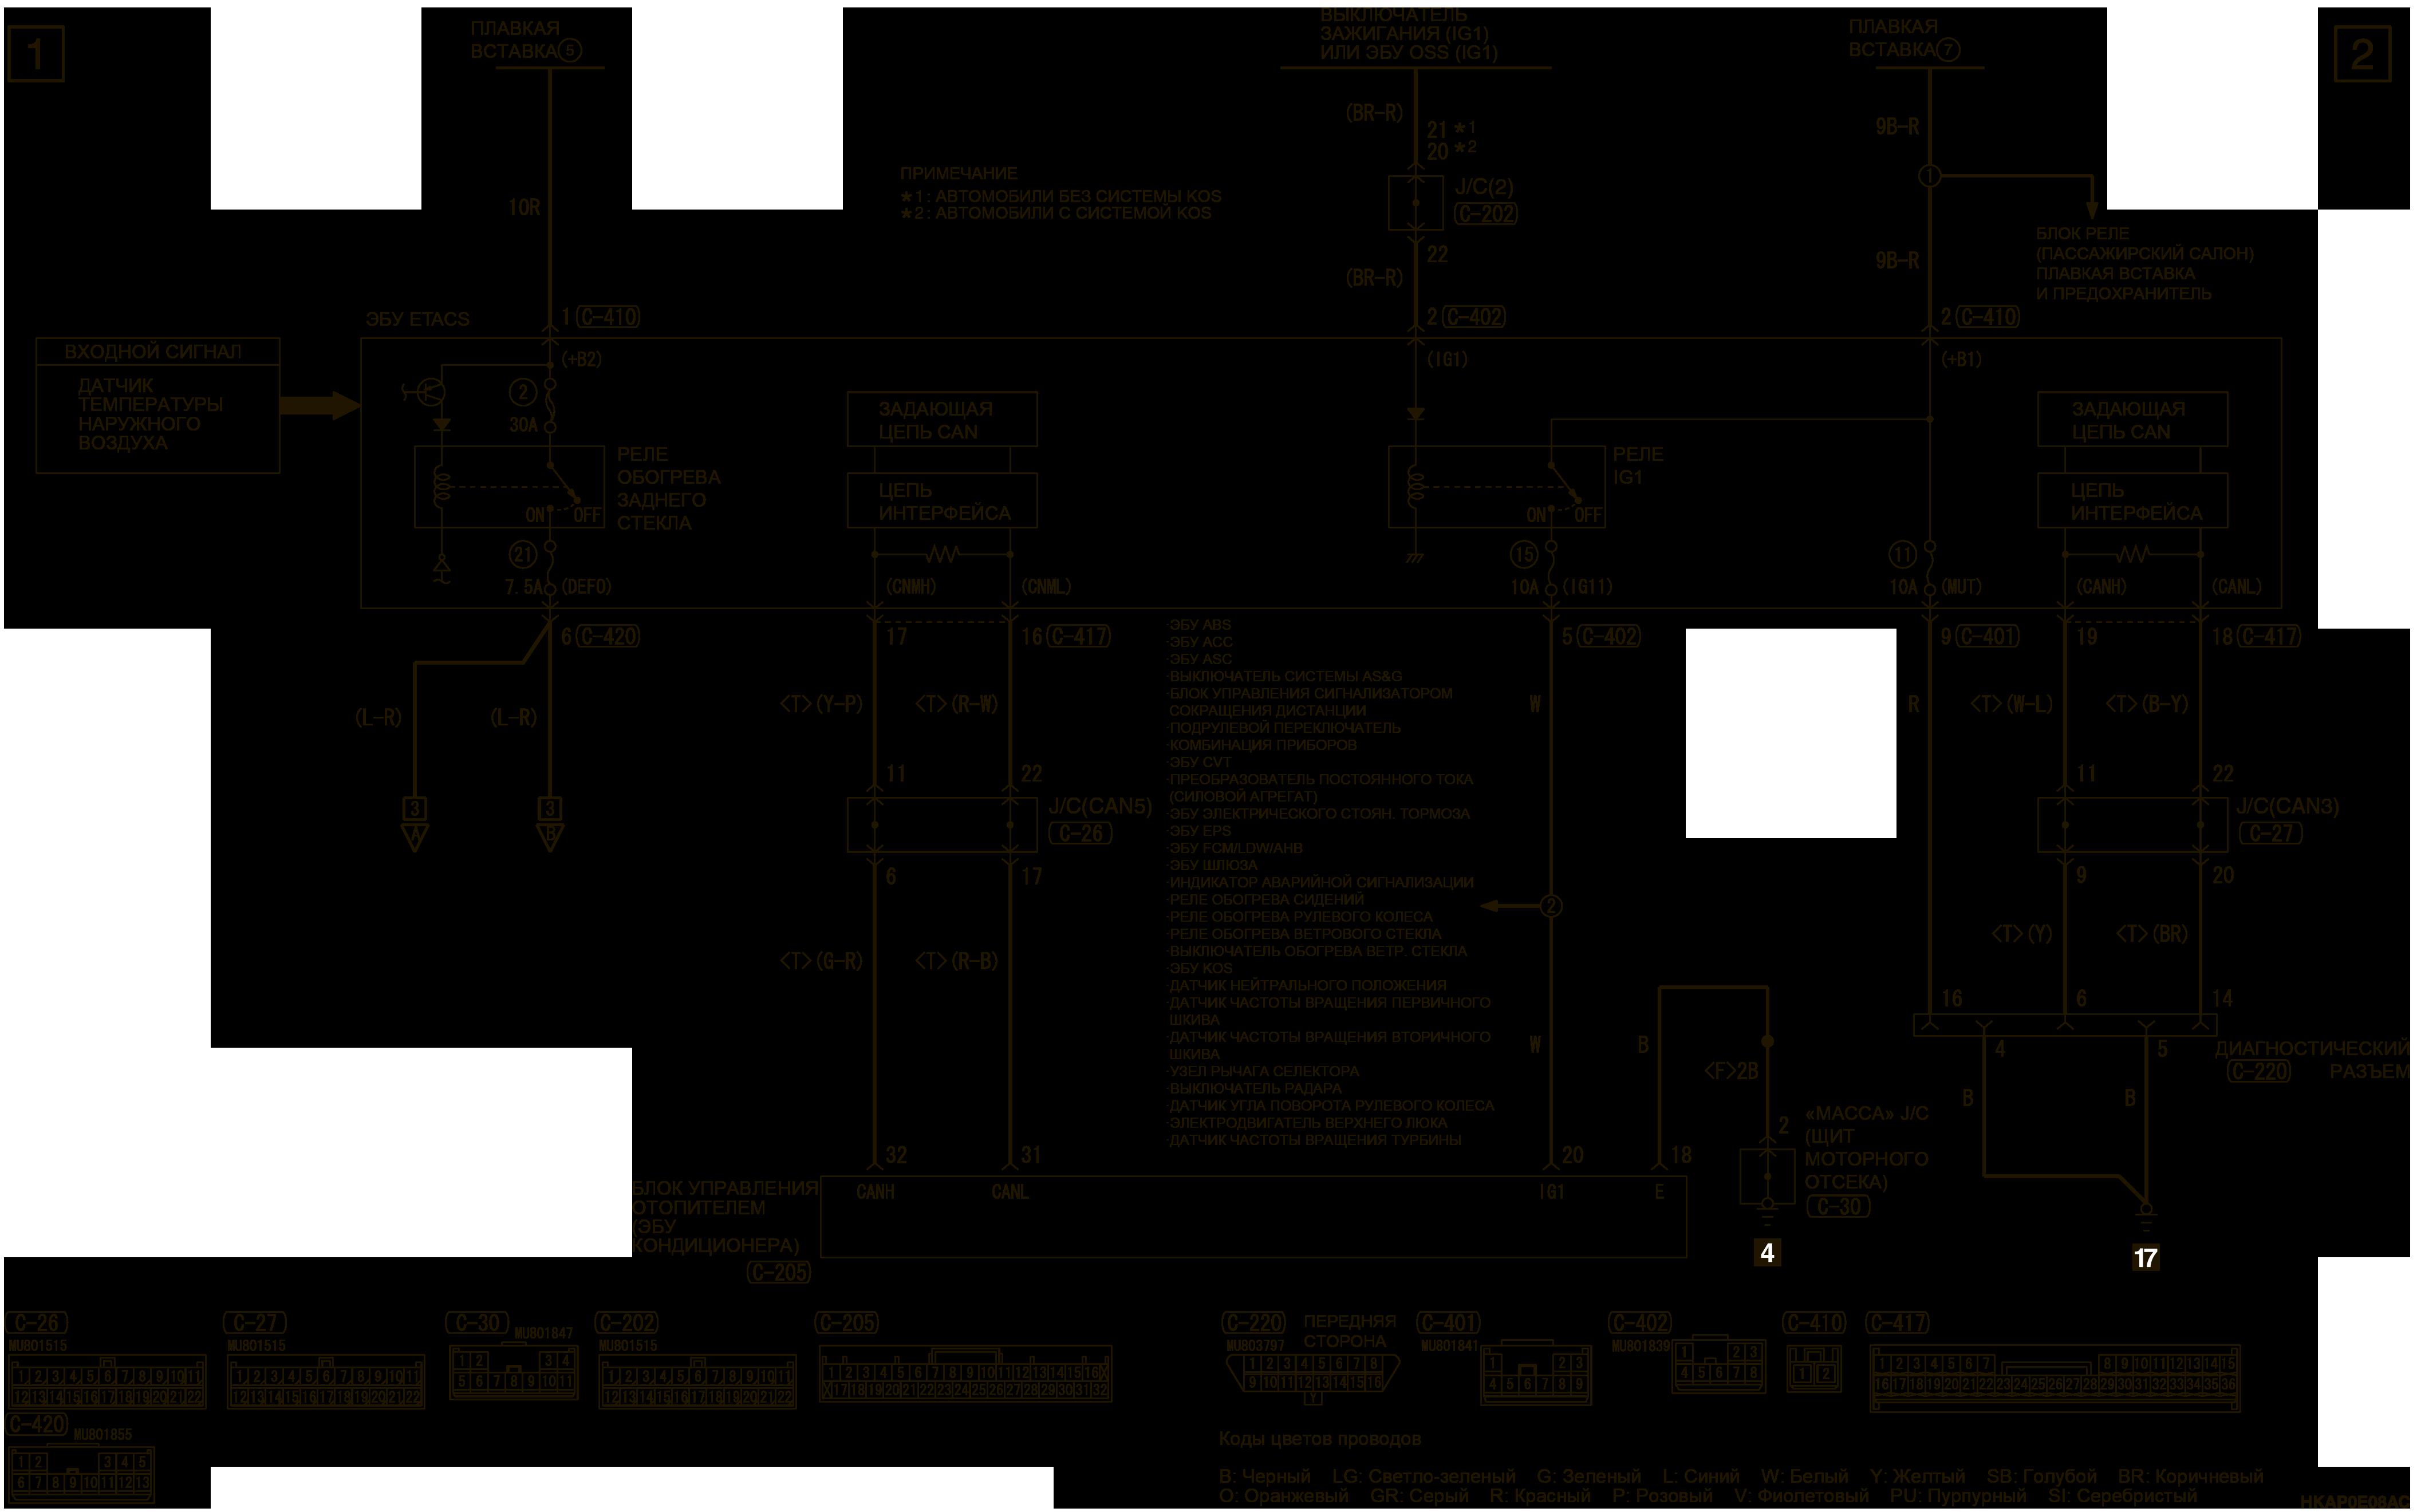 mmc аутлендер 3 2019 электросхемаЭЛЕКТРООБОГРЕВ НАРУЖНЫХ ЗЕРКАЛ ЛЕВАЯ СТОРОНА